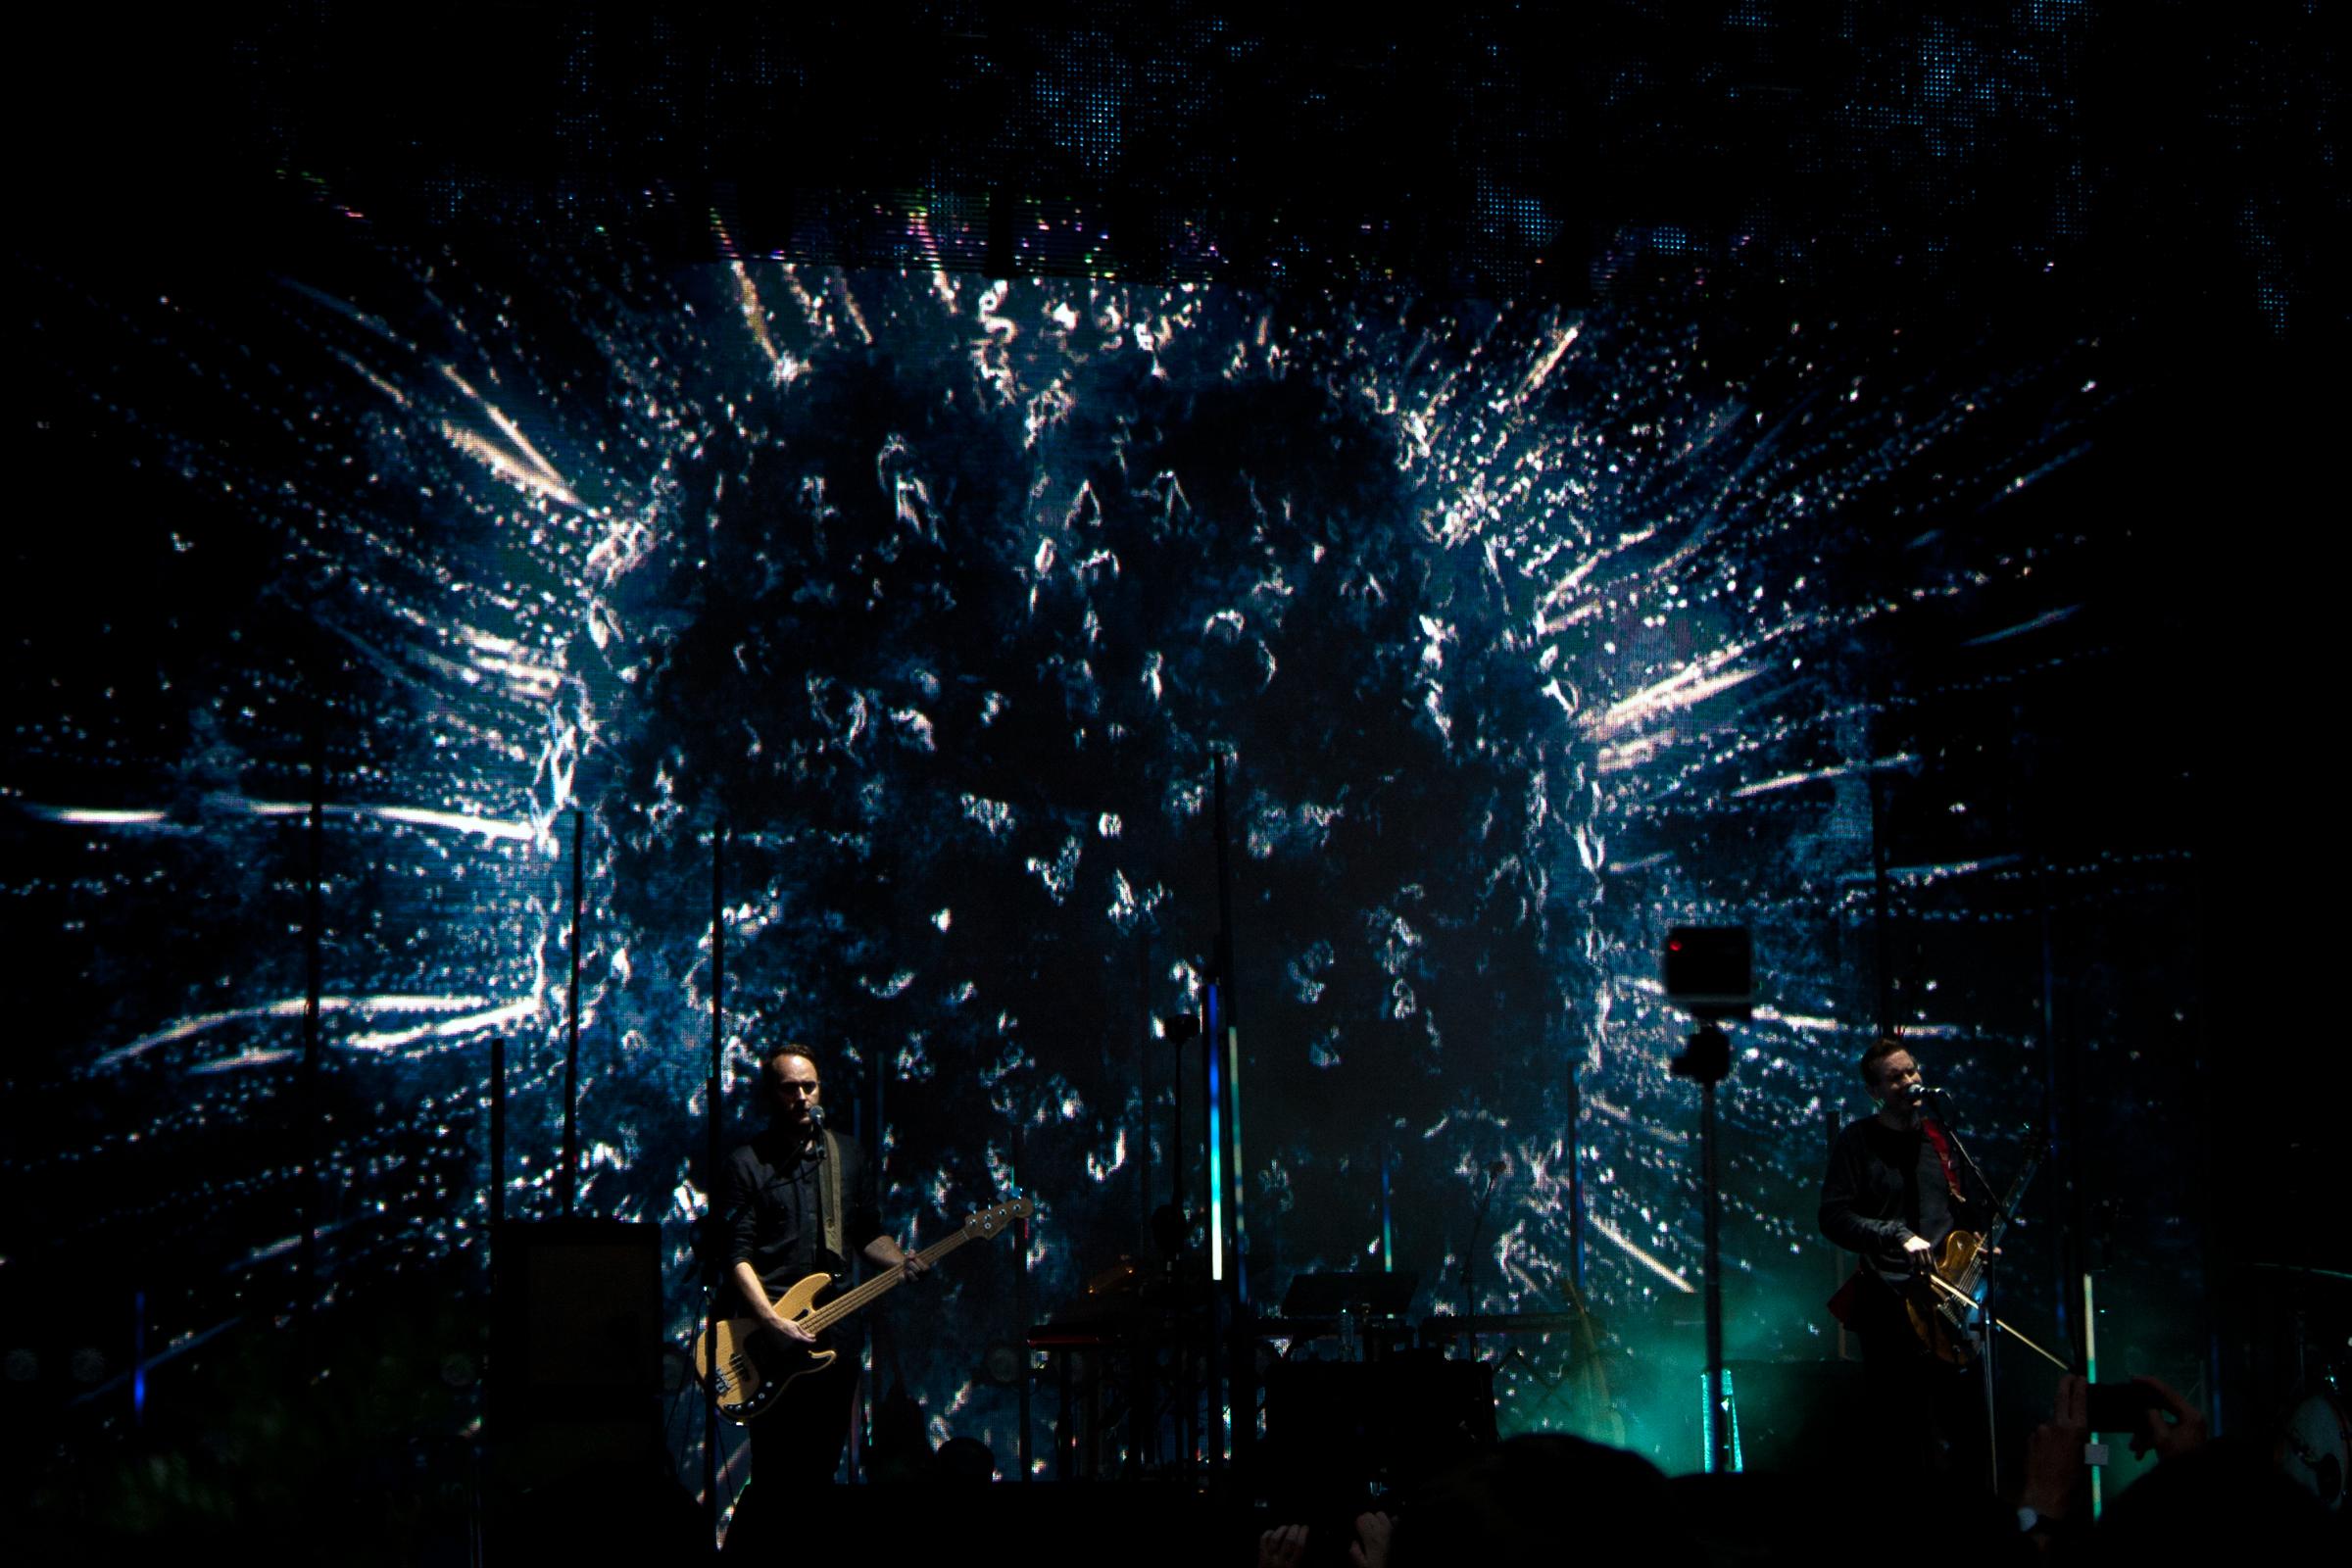 Sigur Ros, Iceland, Stars, Sparkle, Show, HQ Photo